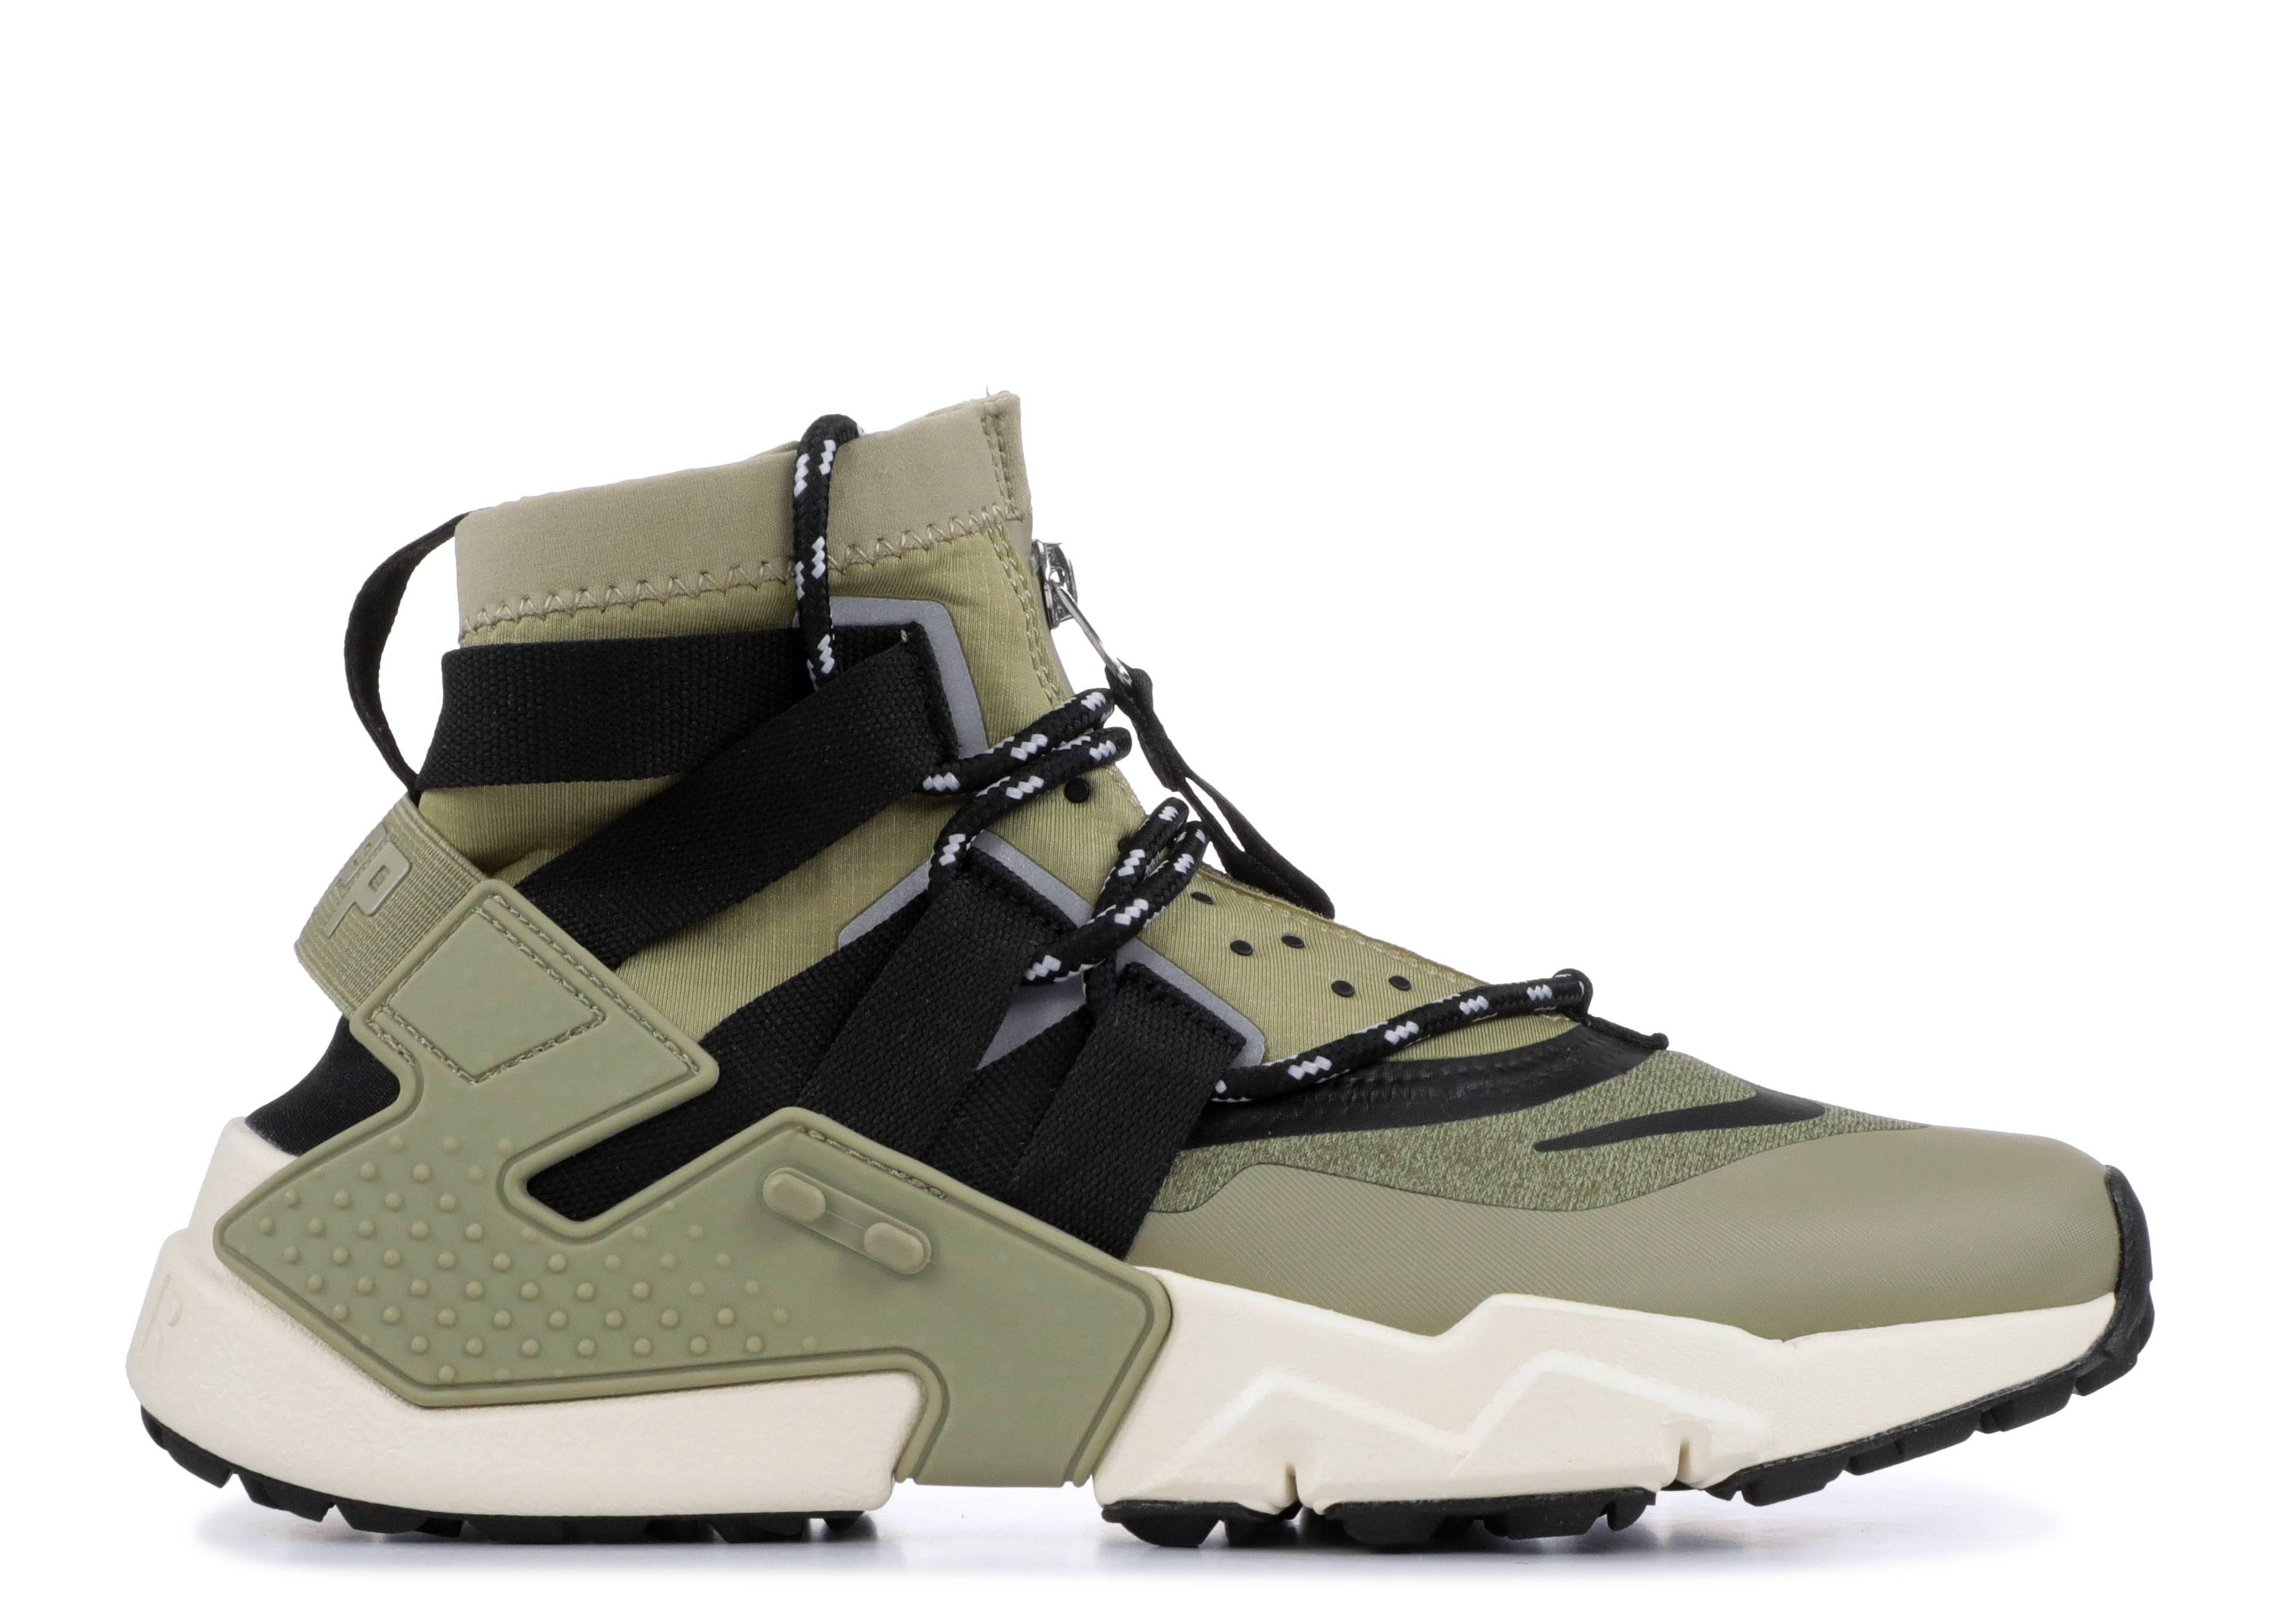 cc9caaaa8c Nike Air Huarache Gripp - Nike - ao1730 200 - neutral olive /black ...